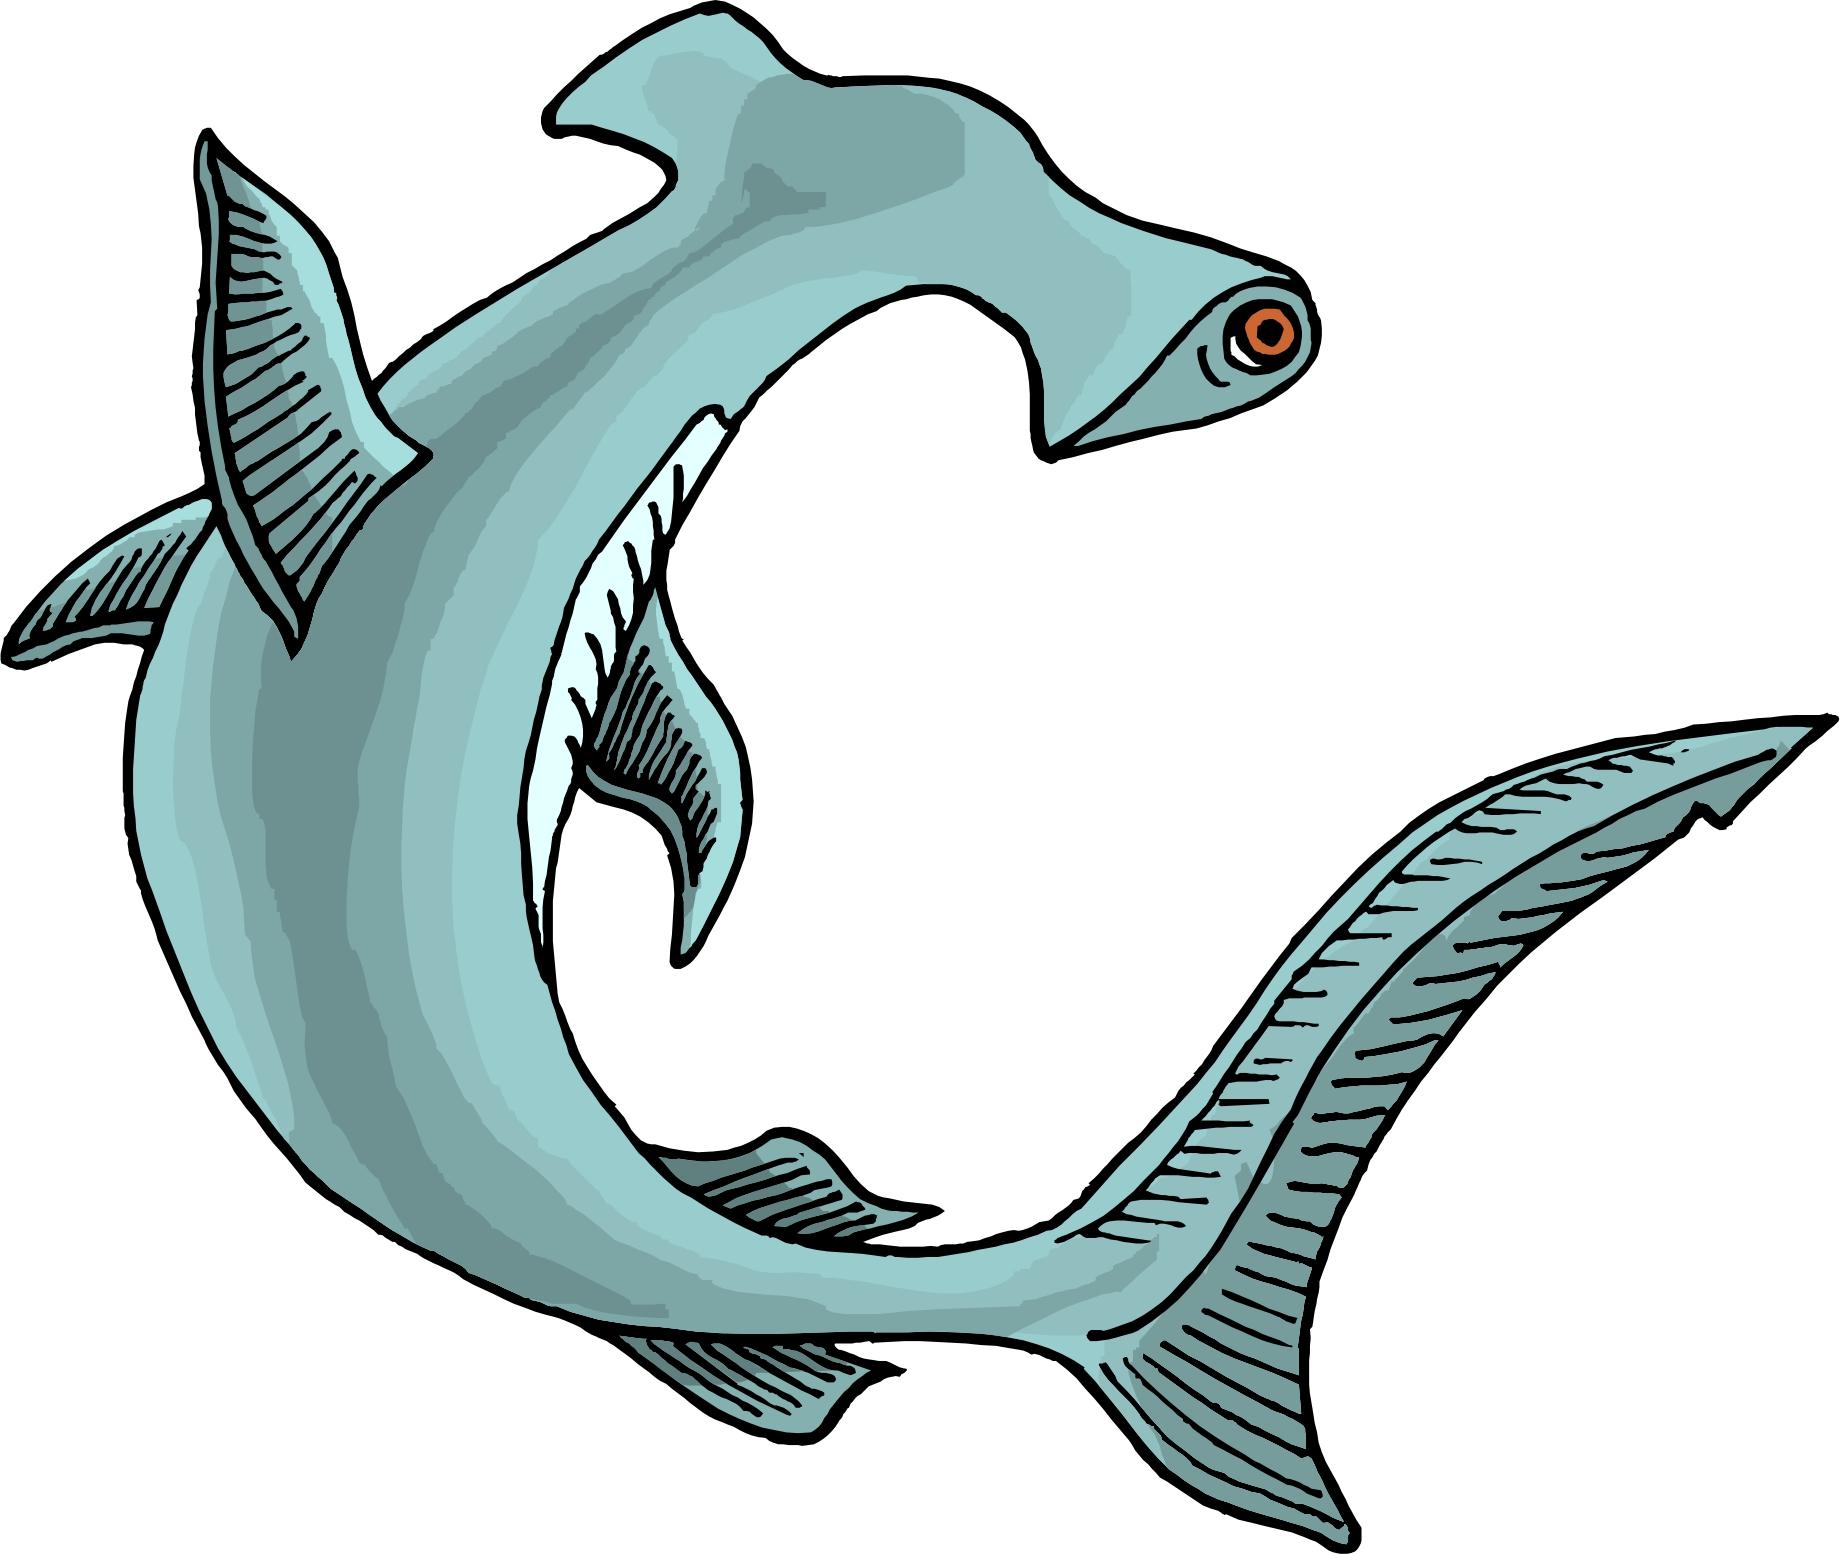 hammerhead shark clipart black and white